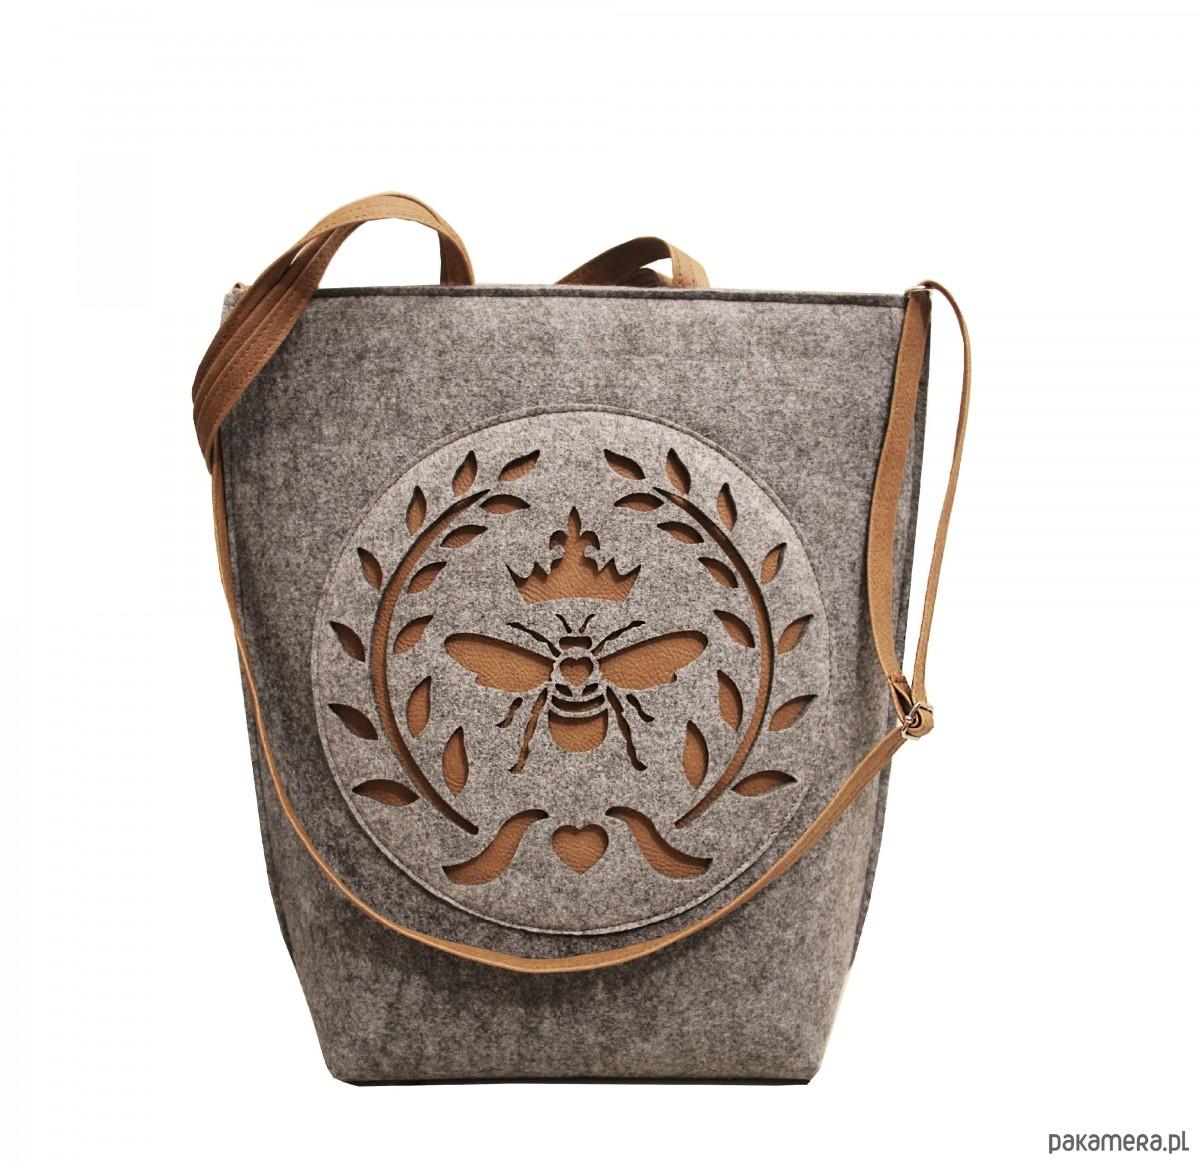 32fa85e77bf93 shopper bag folk mucha - torby XXL - damskie - Pakamera.pl